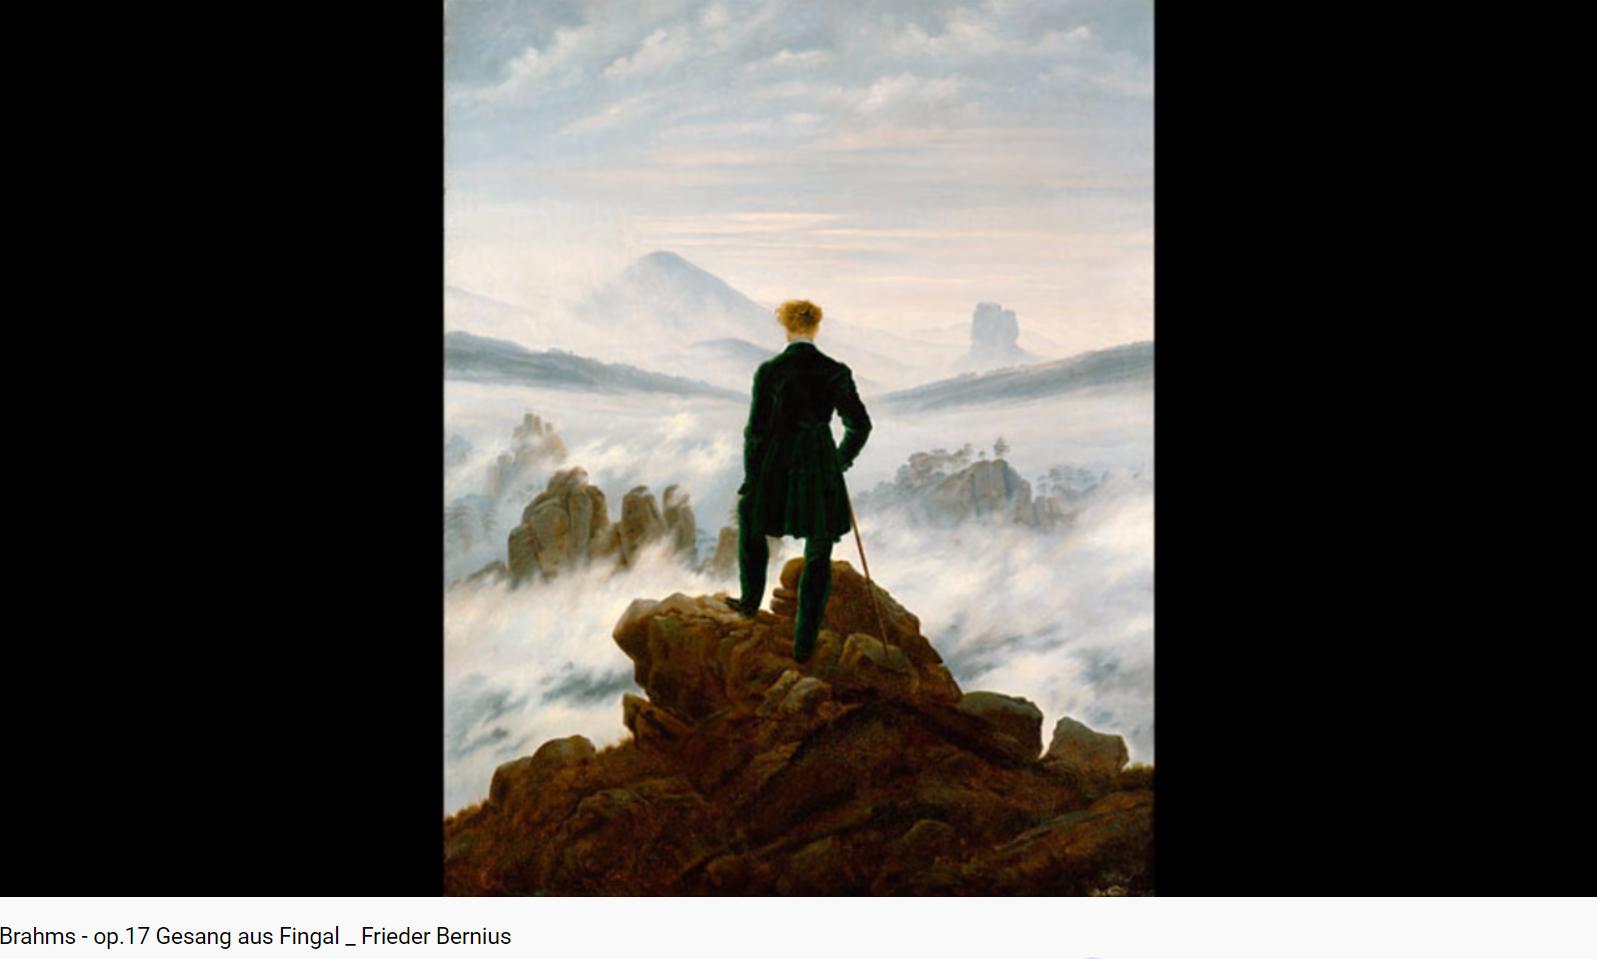 Brahms opus 17 Gesang aus Fingal